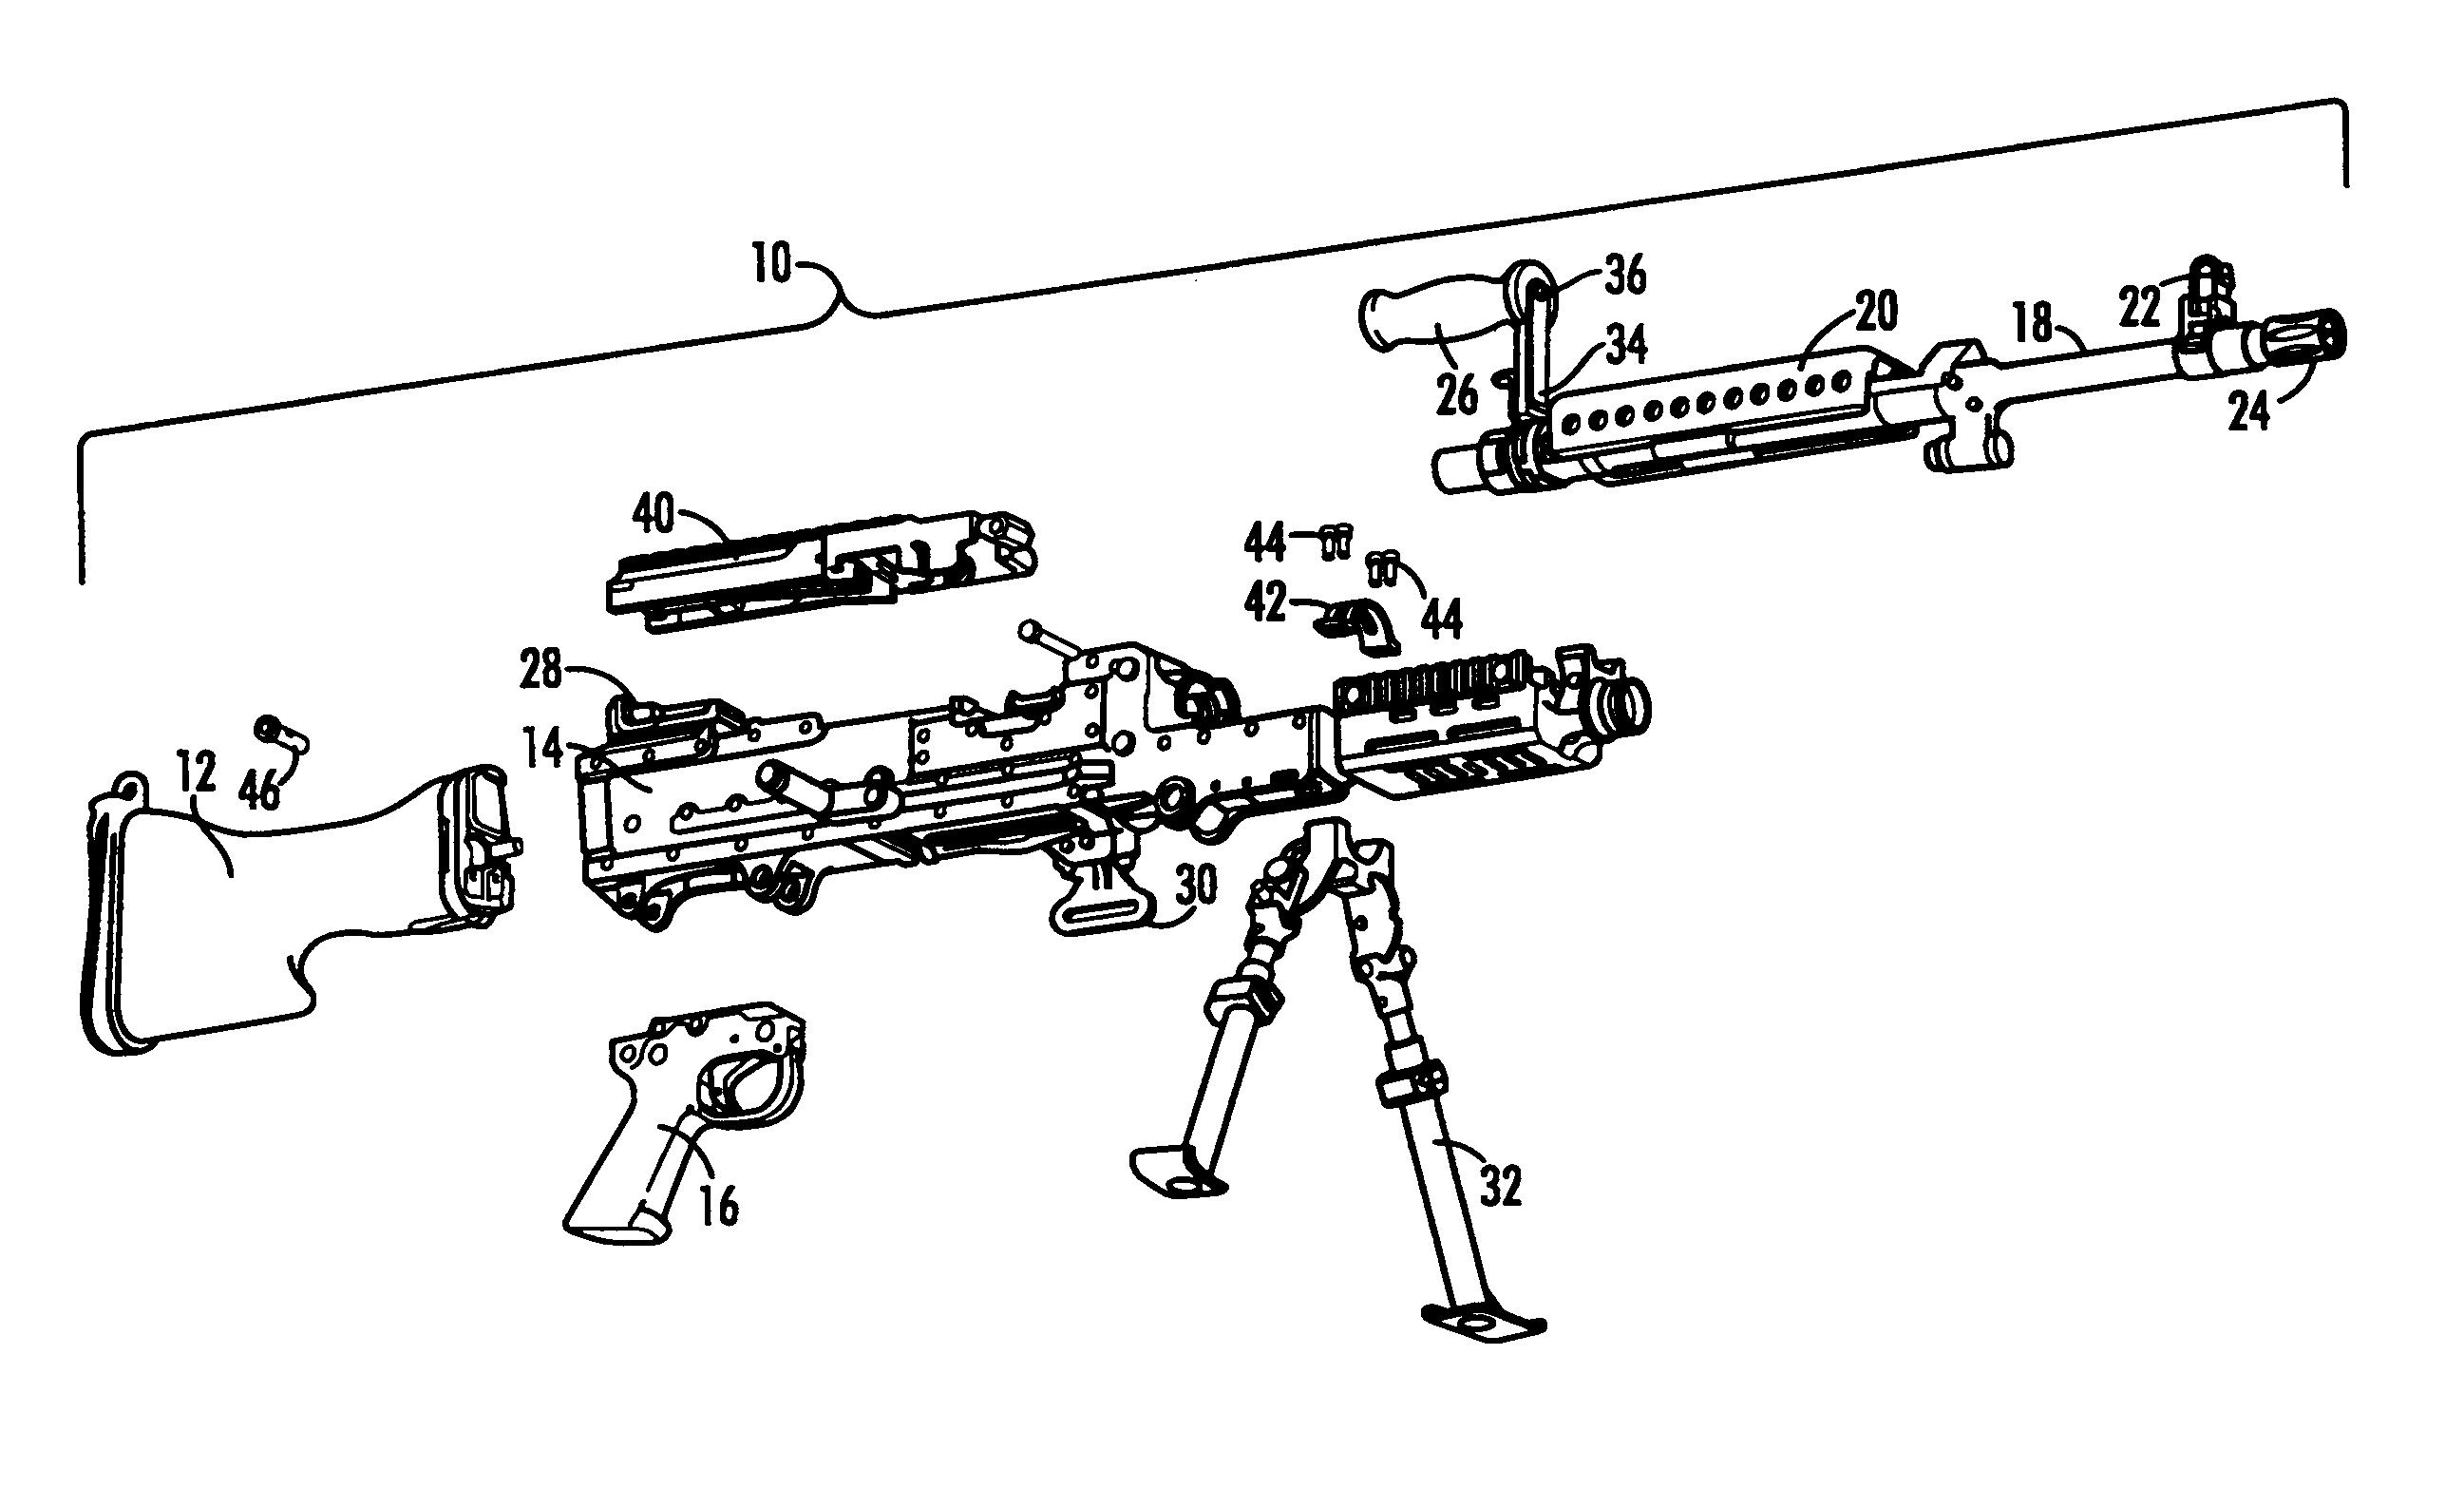 M240 Machine Gun Parts Diagram Bing Images